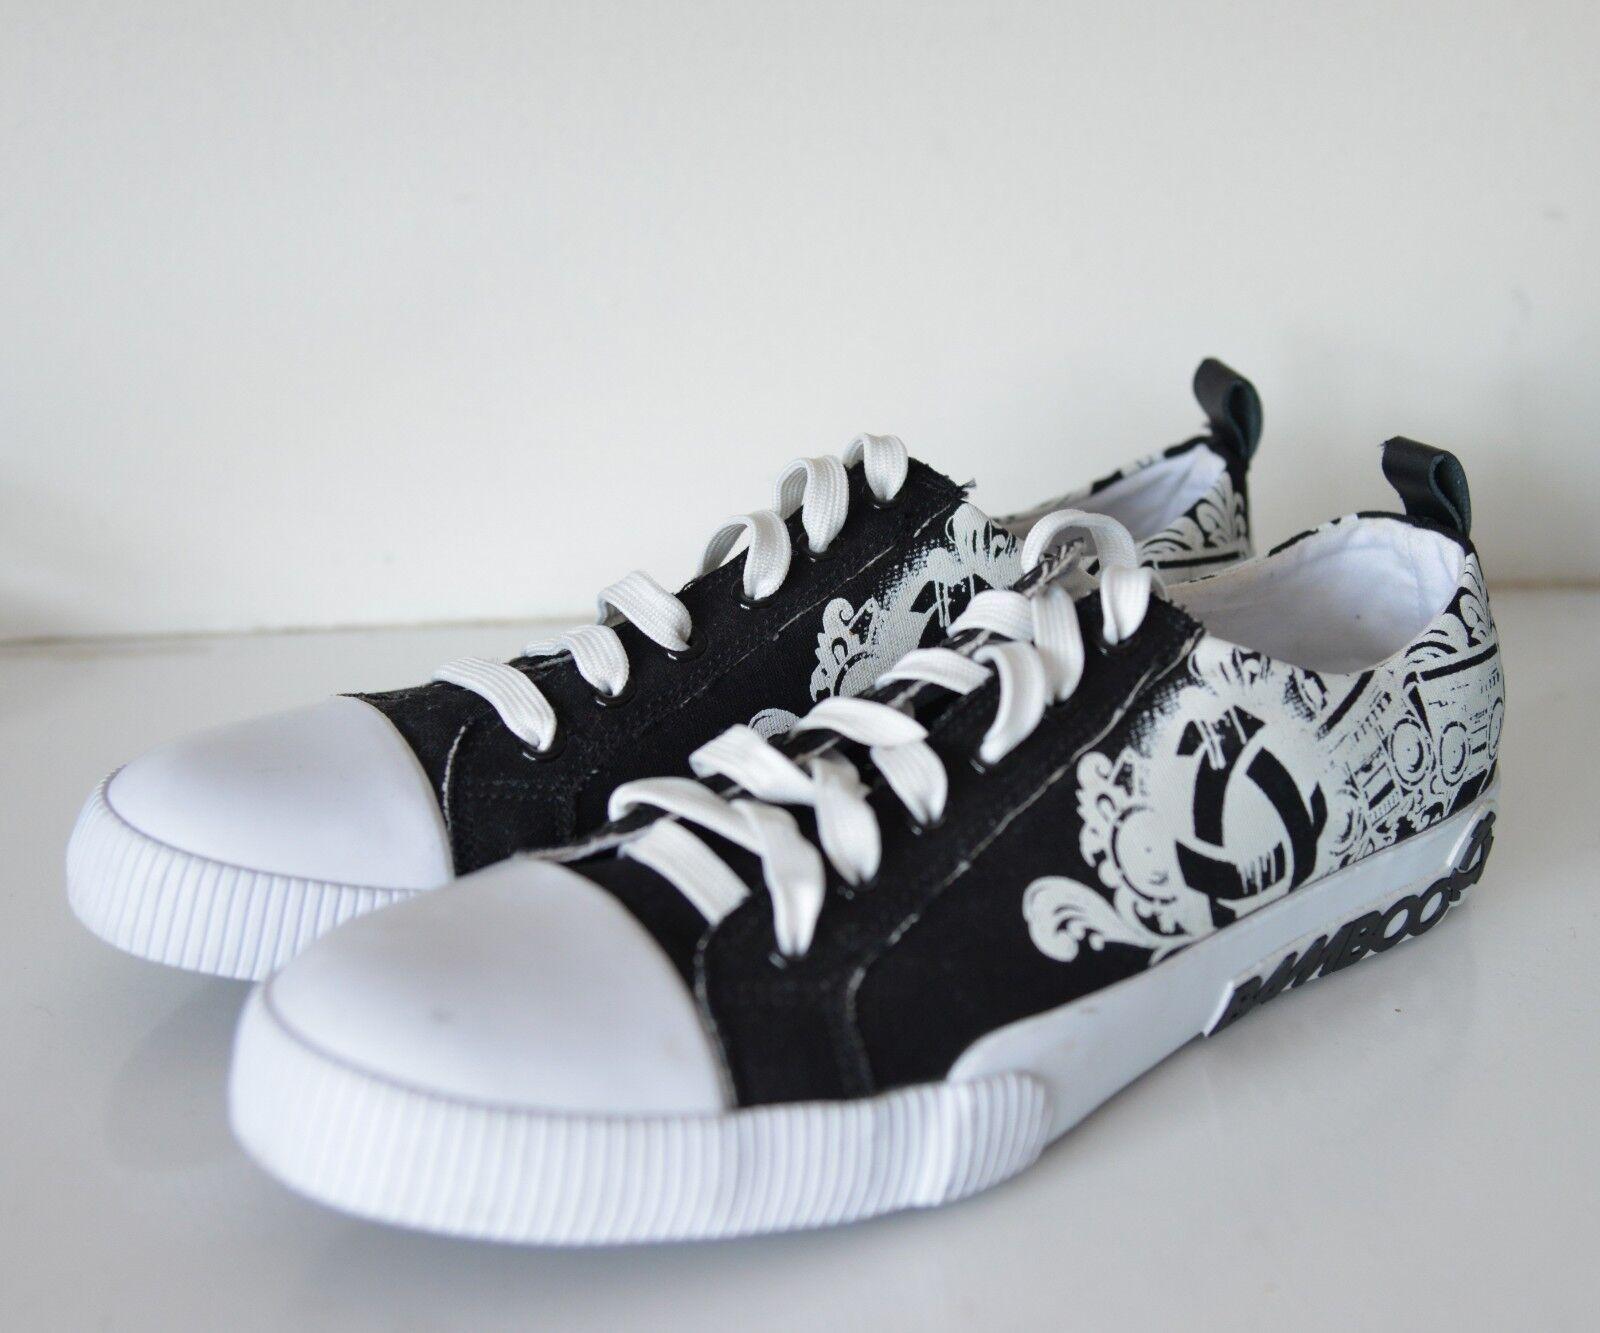 Bamboo Premium Kudo Homme Noir Blanc Imprime Toile Baskets Chaussures Baskets UK 8